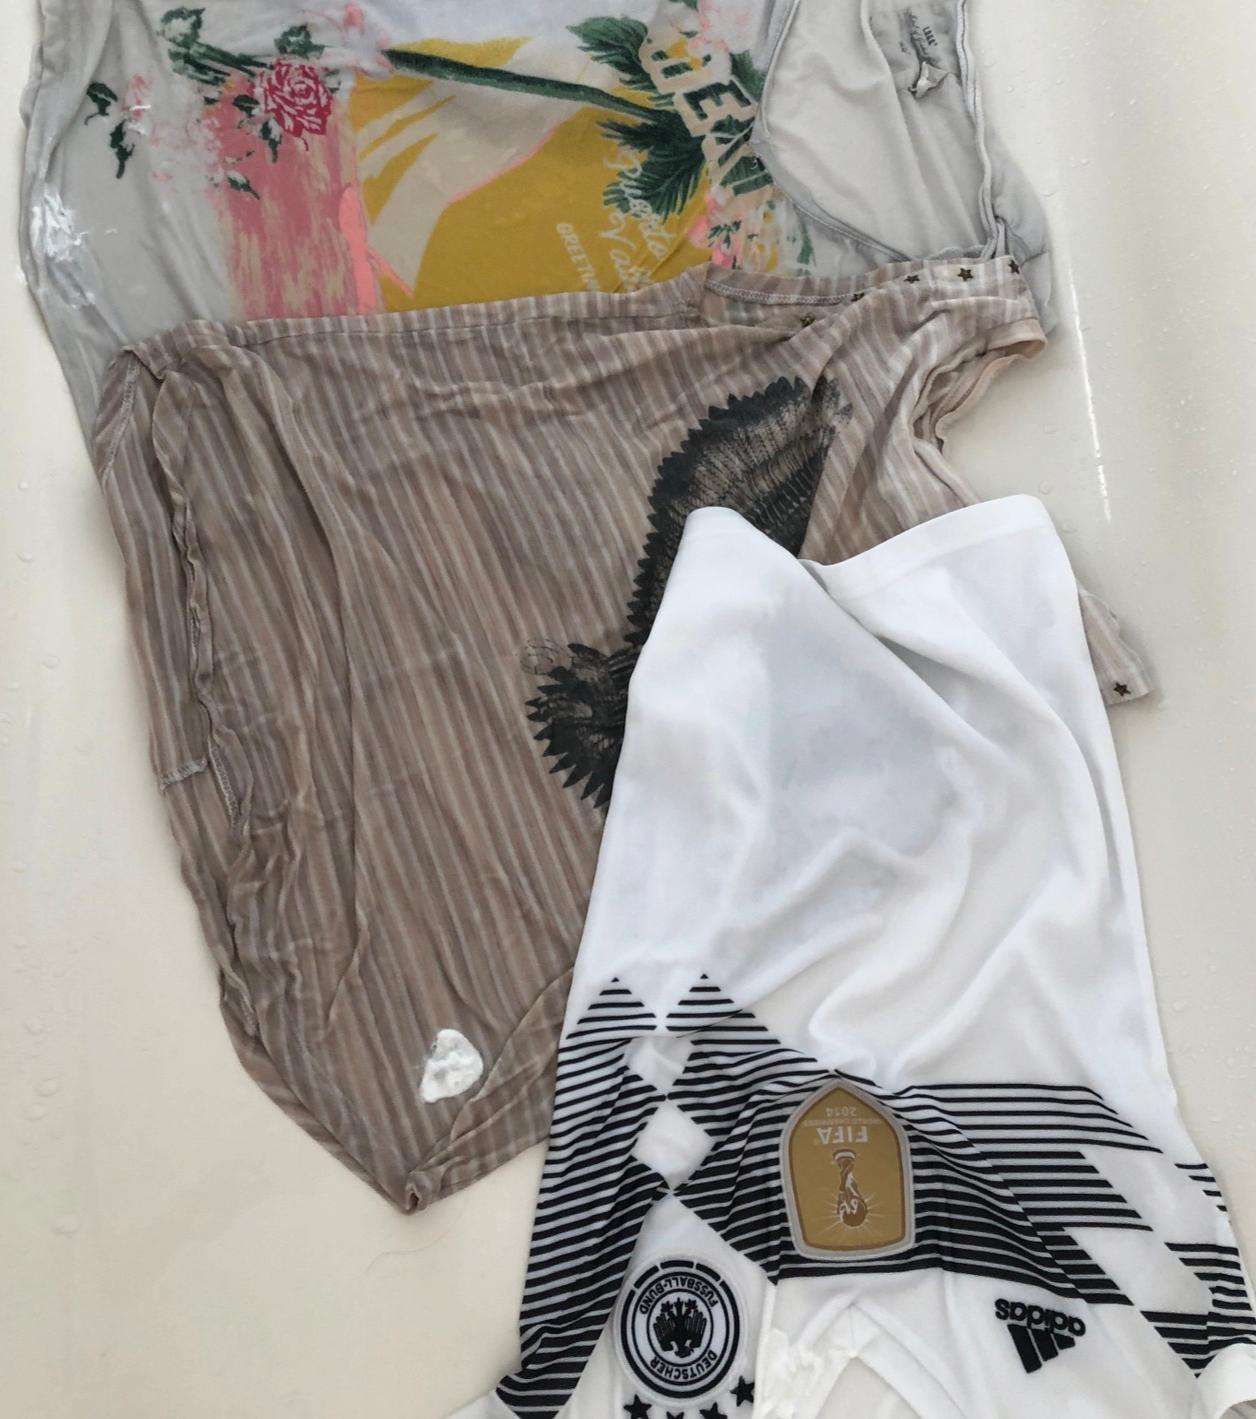 Fettflecken Kleidung Entfernen